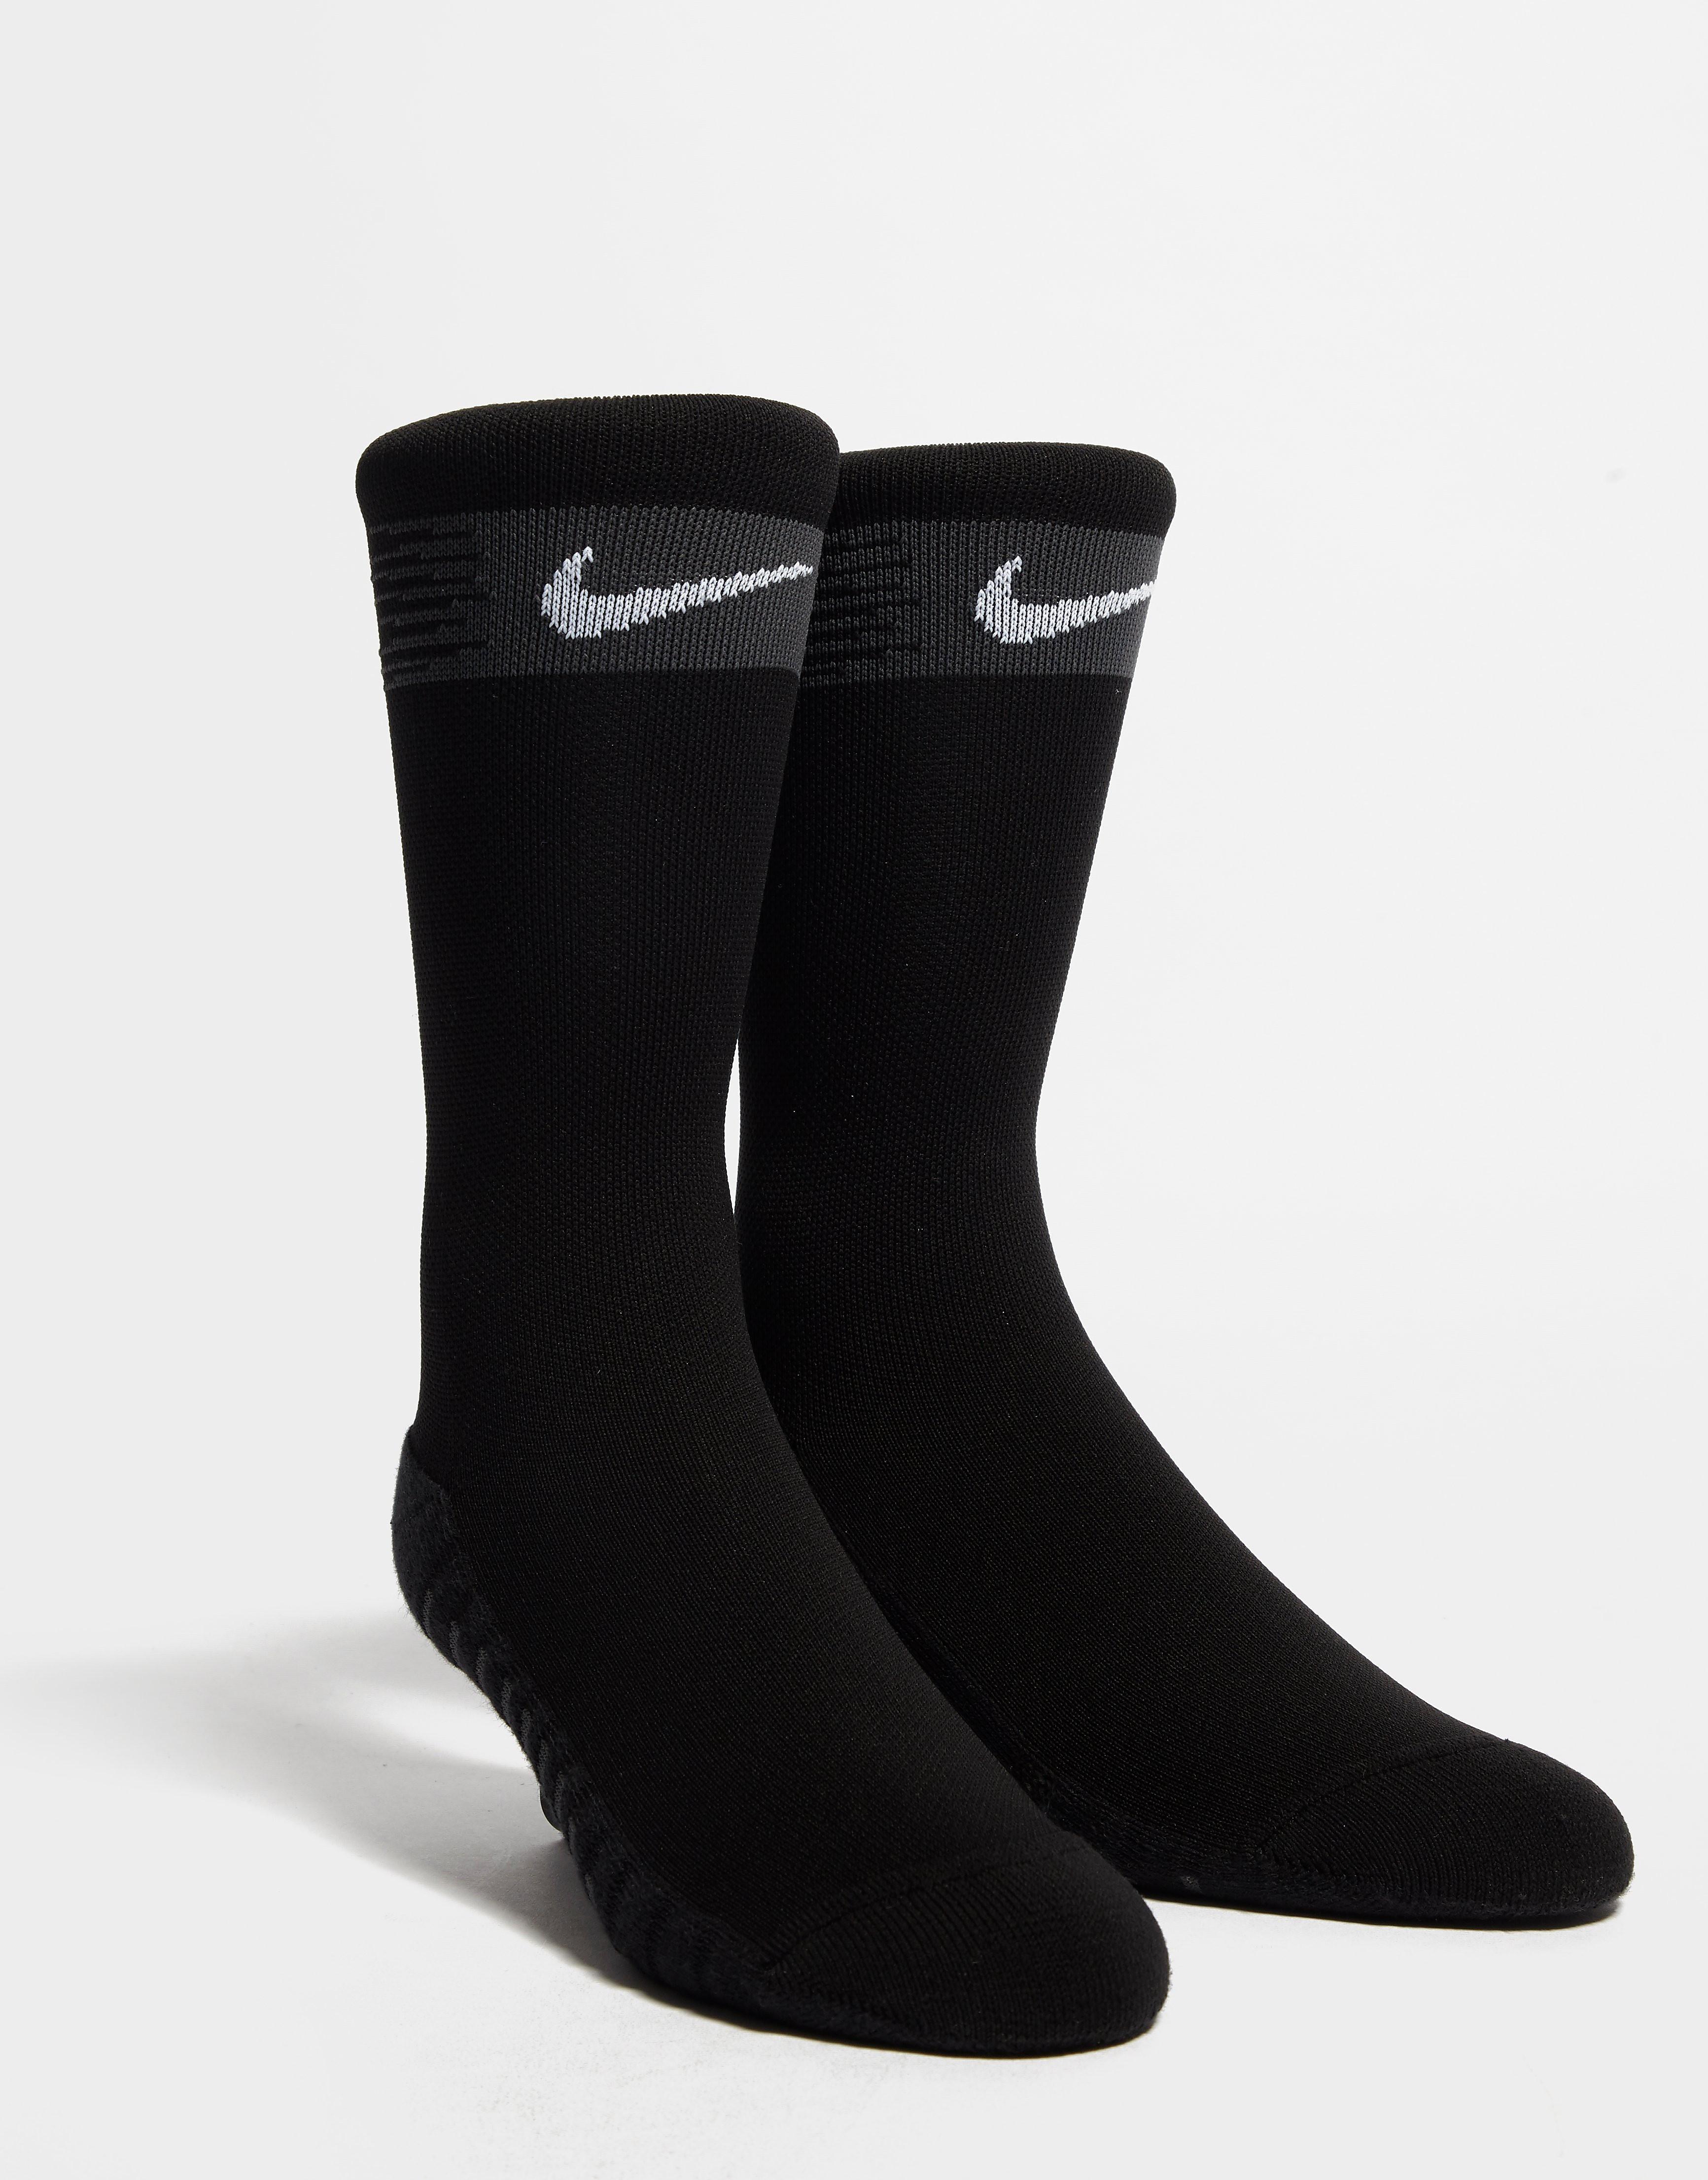 Nike calcetines MatchFit Crew Football